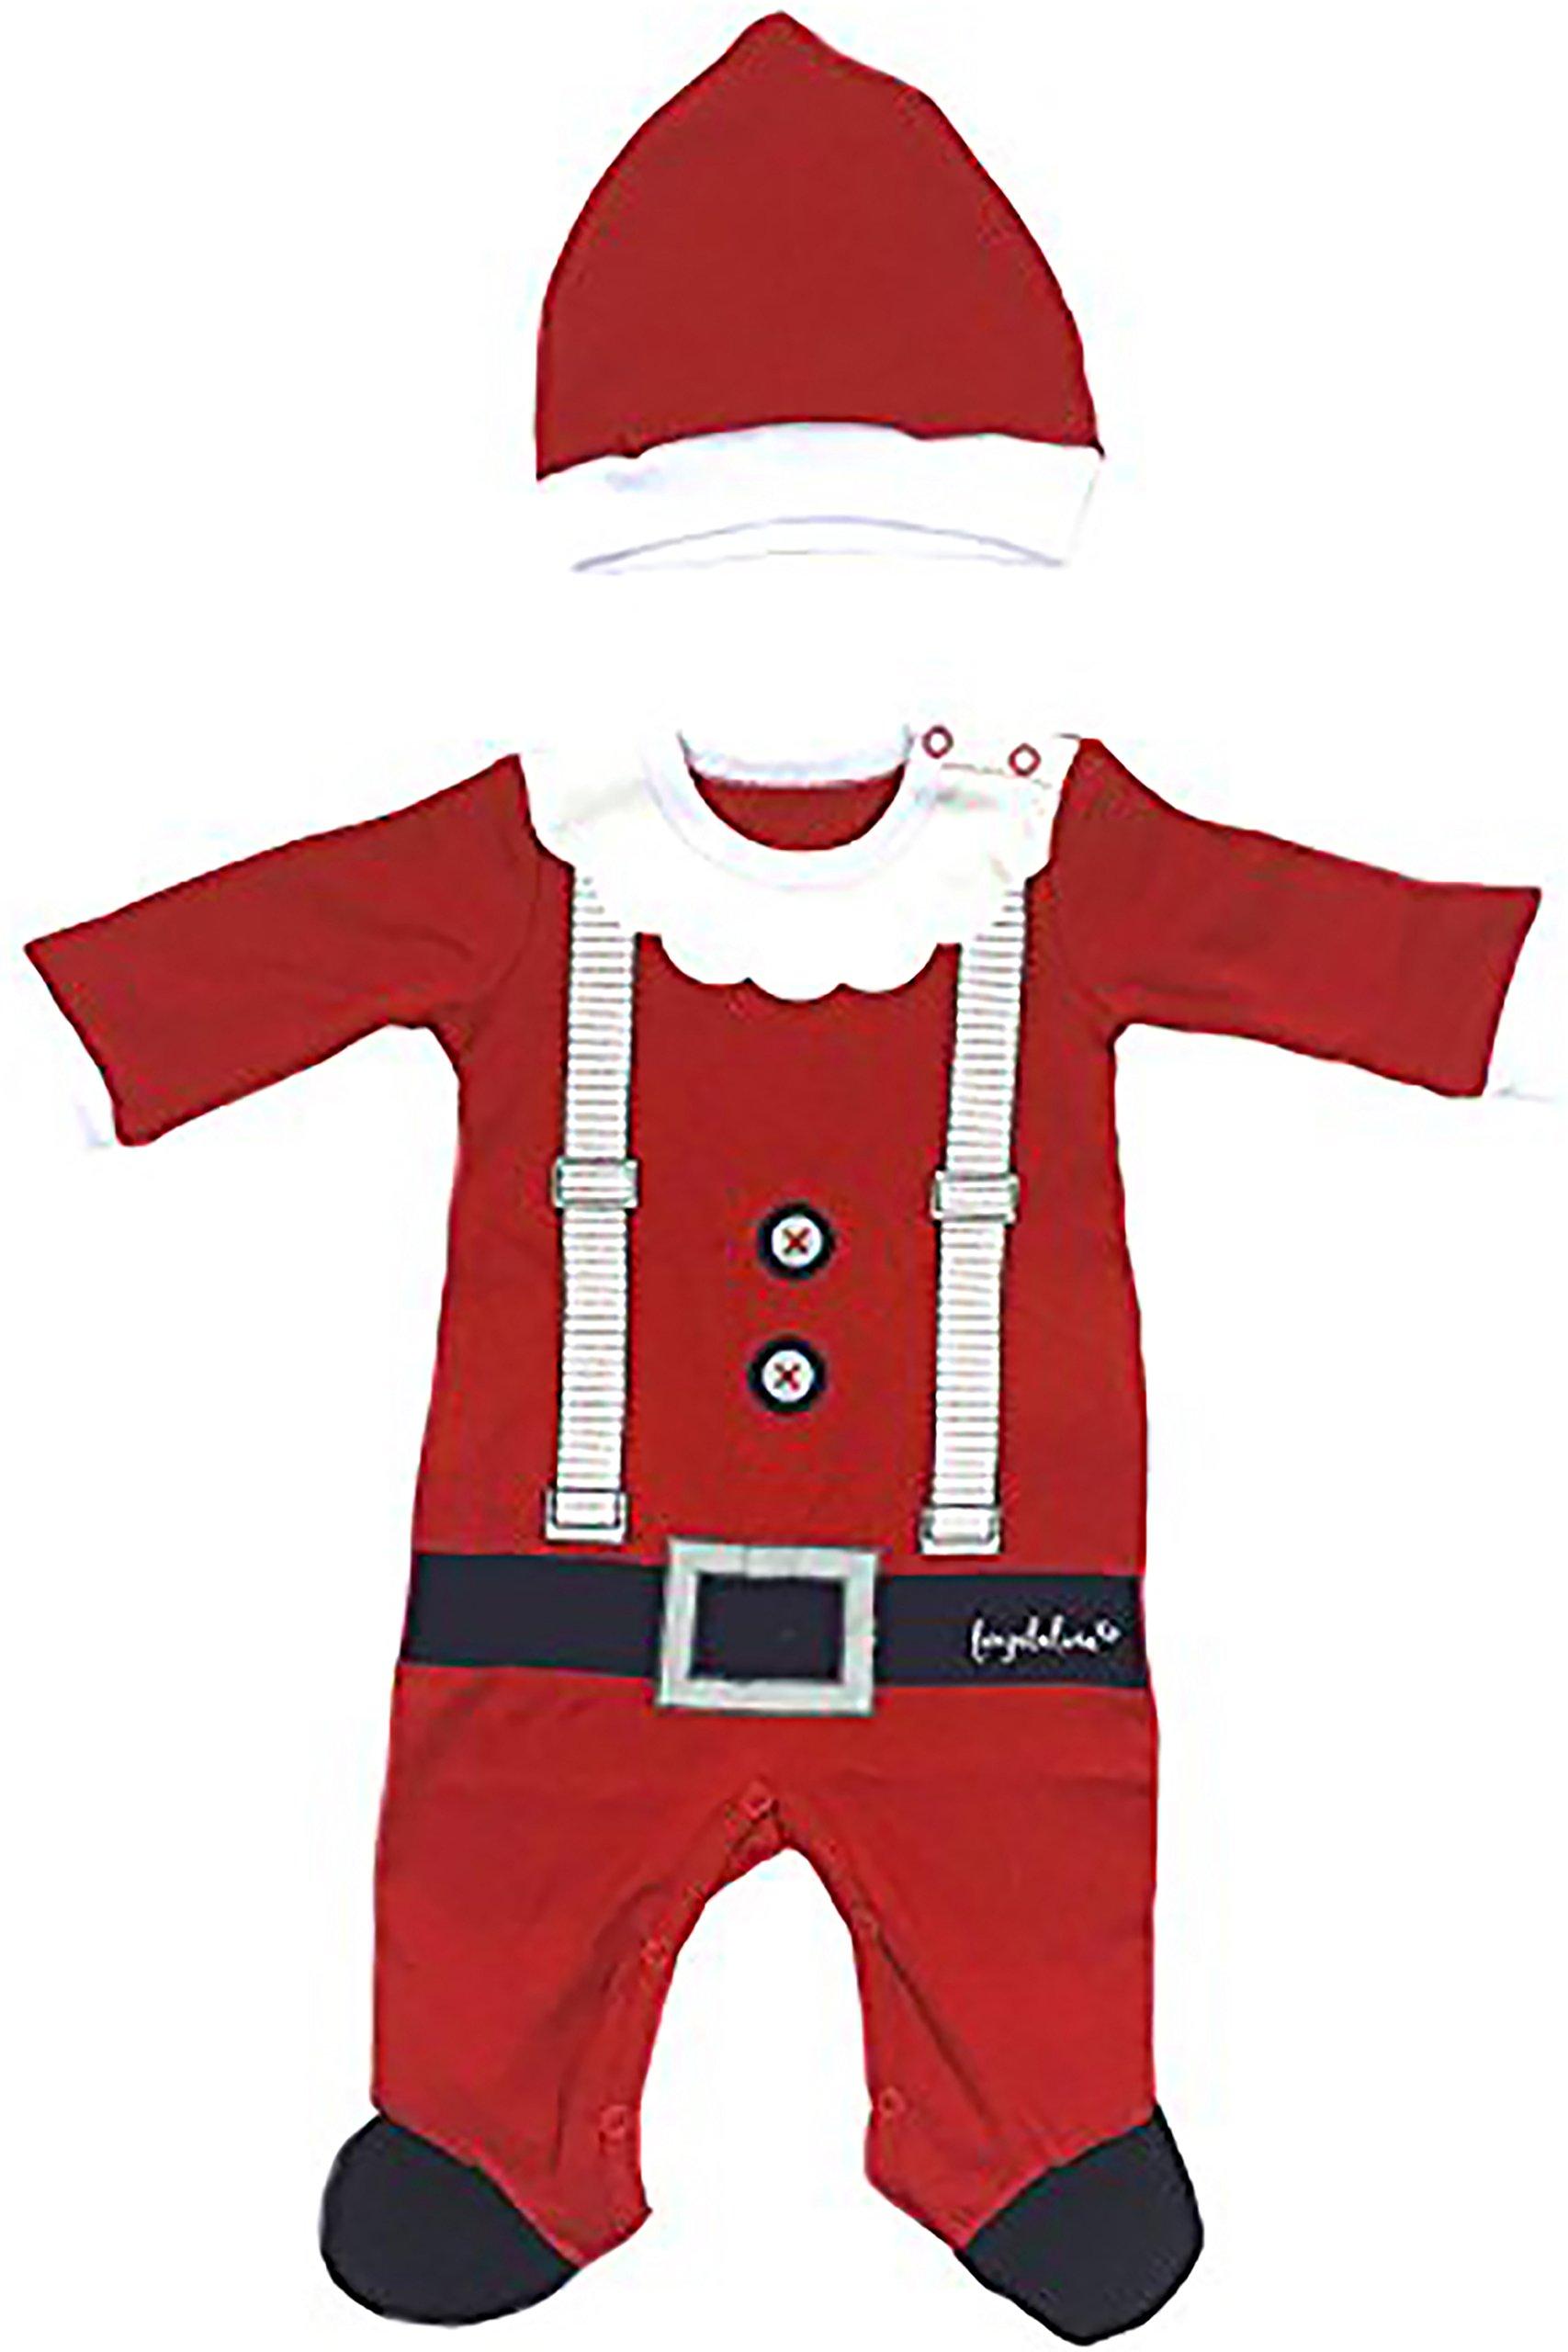 Fayfaire Christmas Pajamas Boutique Quality: Adorable Xmas Santa Suit with Hat 6-12M